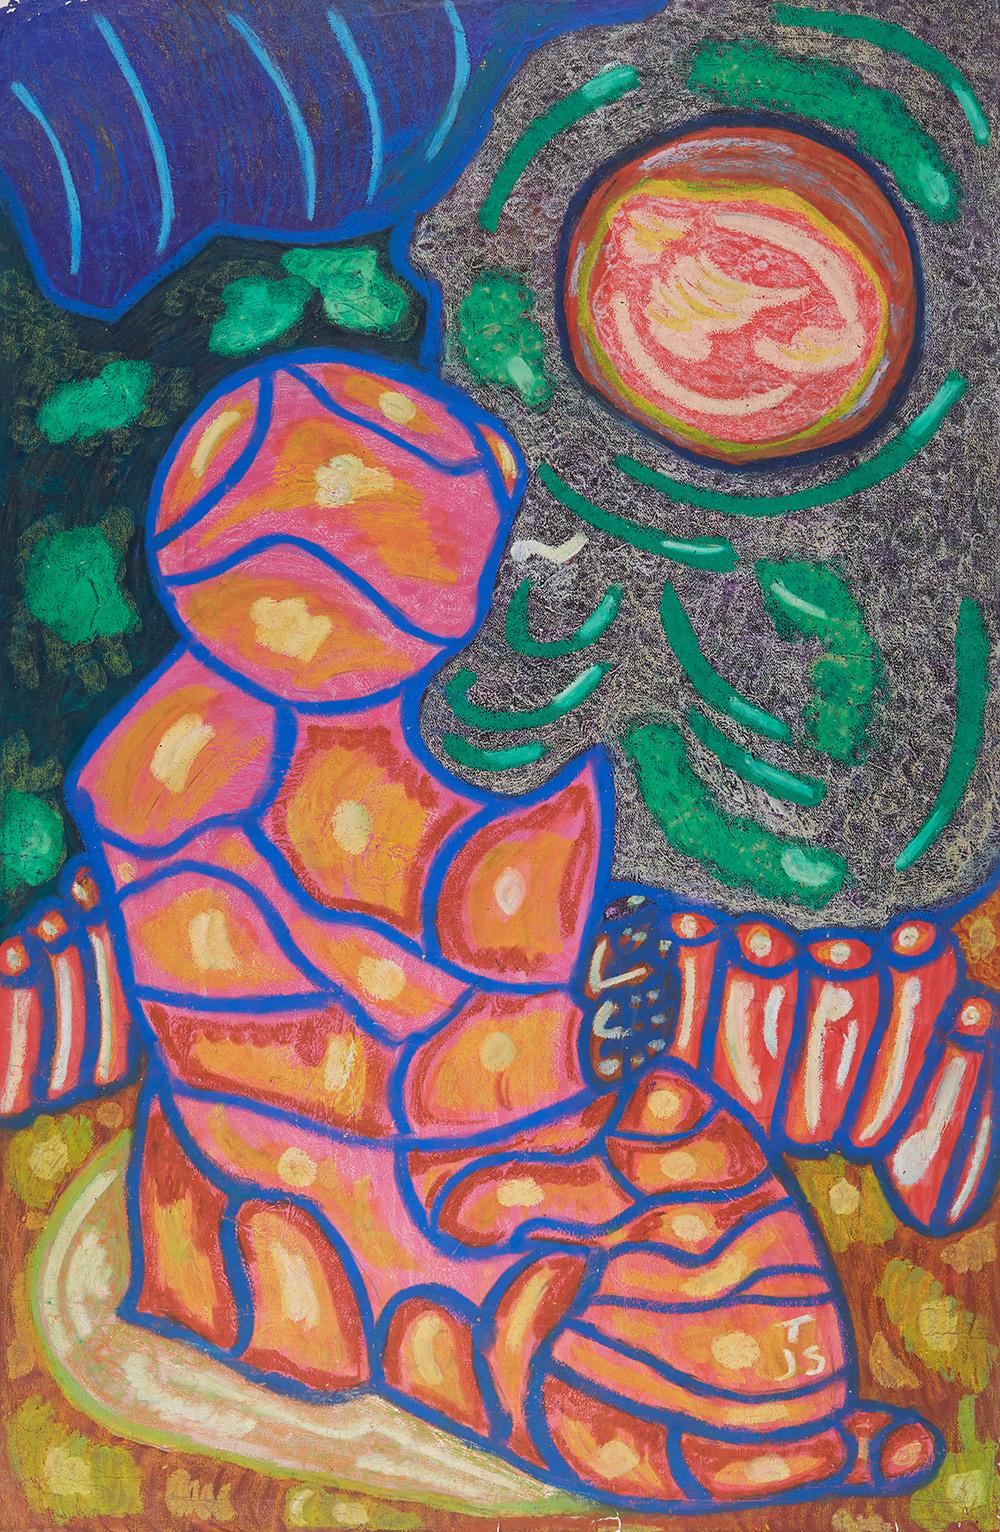 Anthony Joseph Salvatore  1 John 1, v.9  , 1989 Oil stick, acrylic/paper 40 x 26 inches 101.6 x 66 cm JS 173